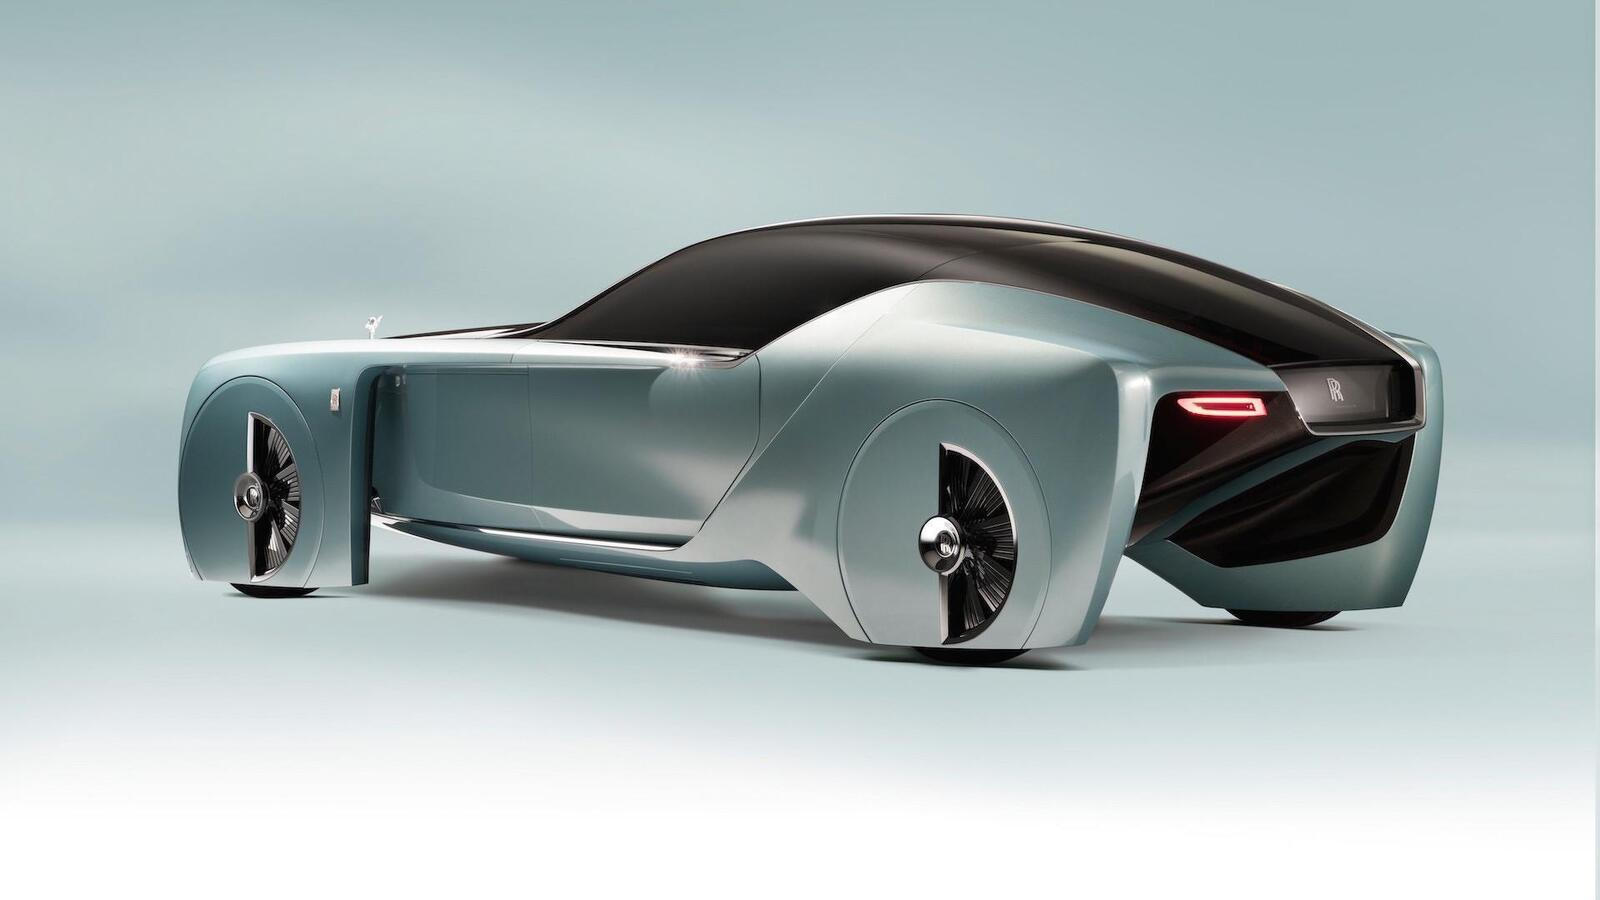 rolls-royce-vision-next-100-concept3.jpg